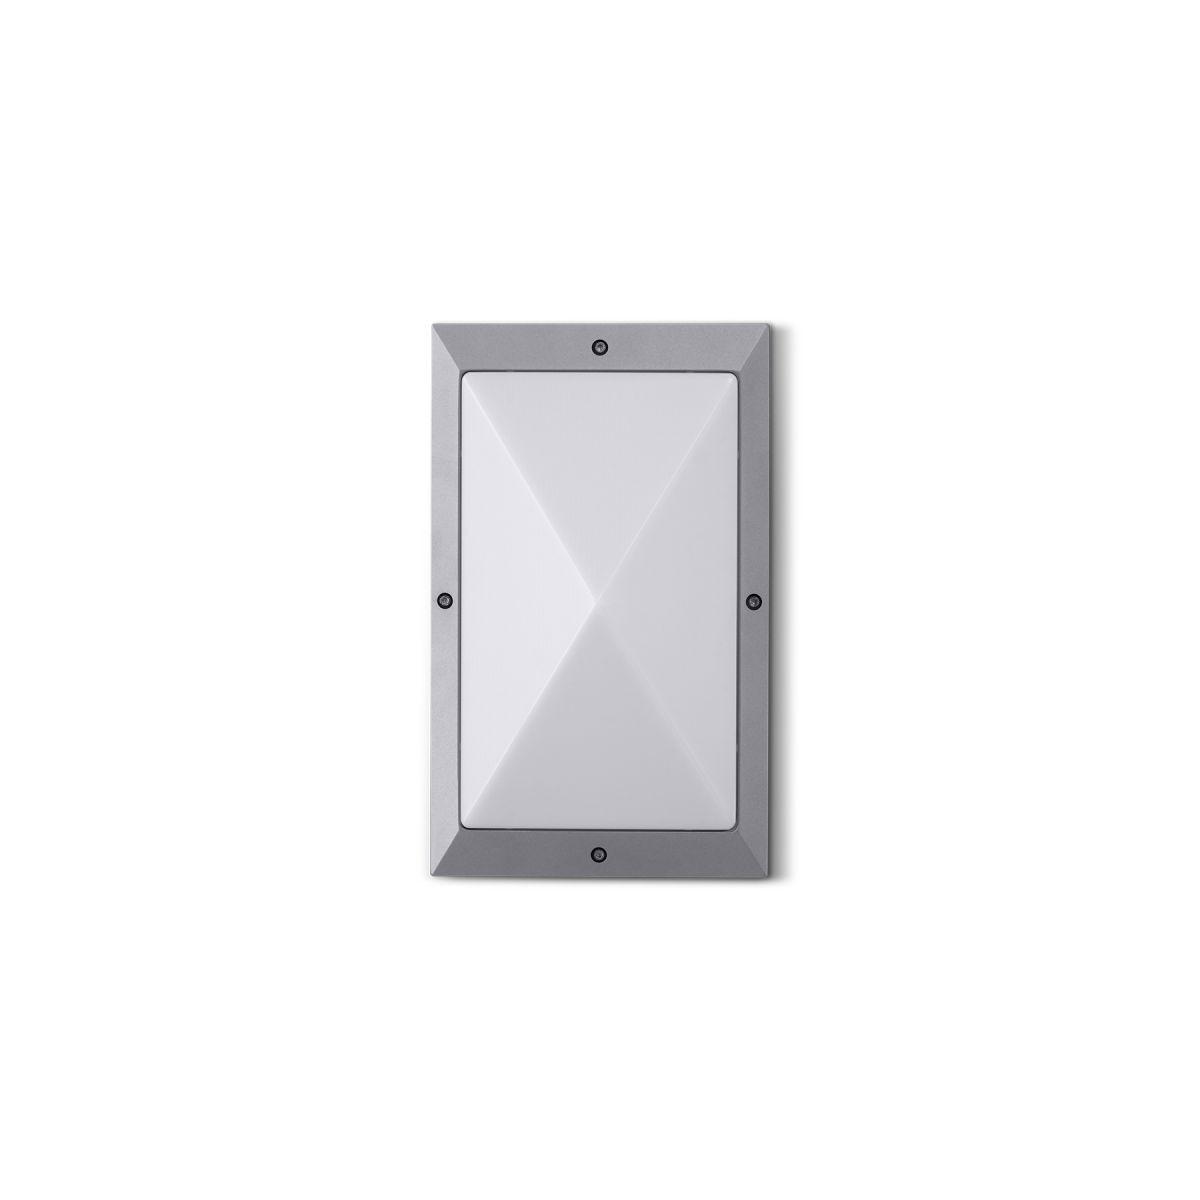 XEON Roof - Wall Light